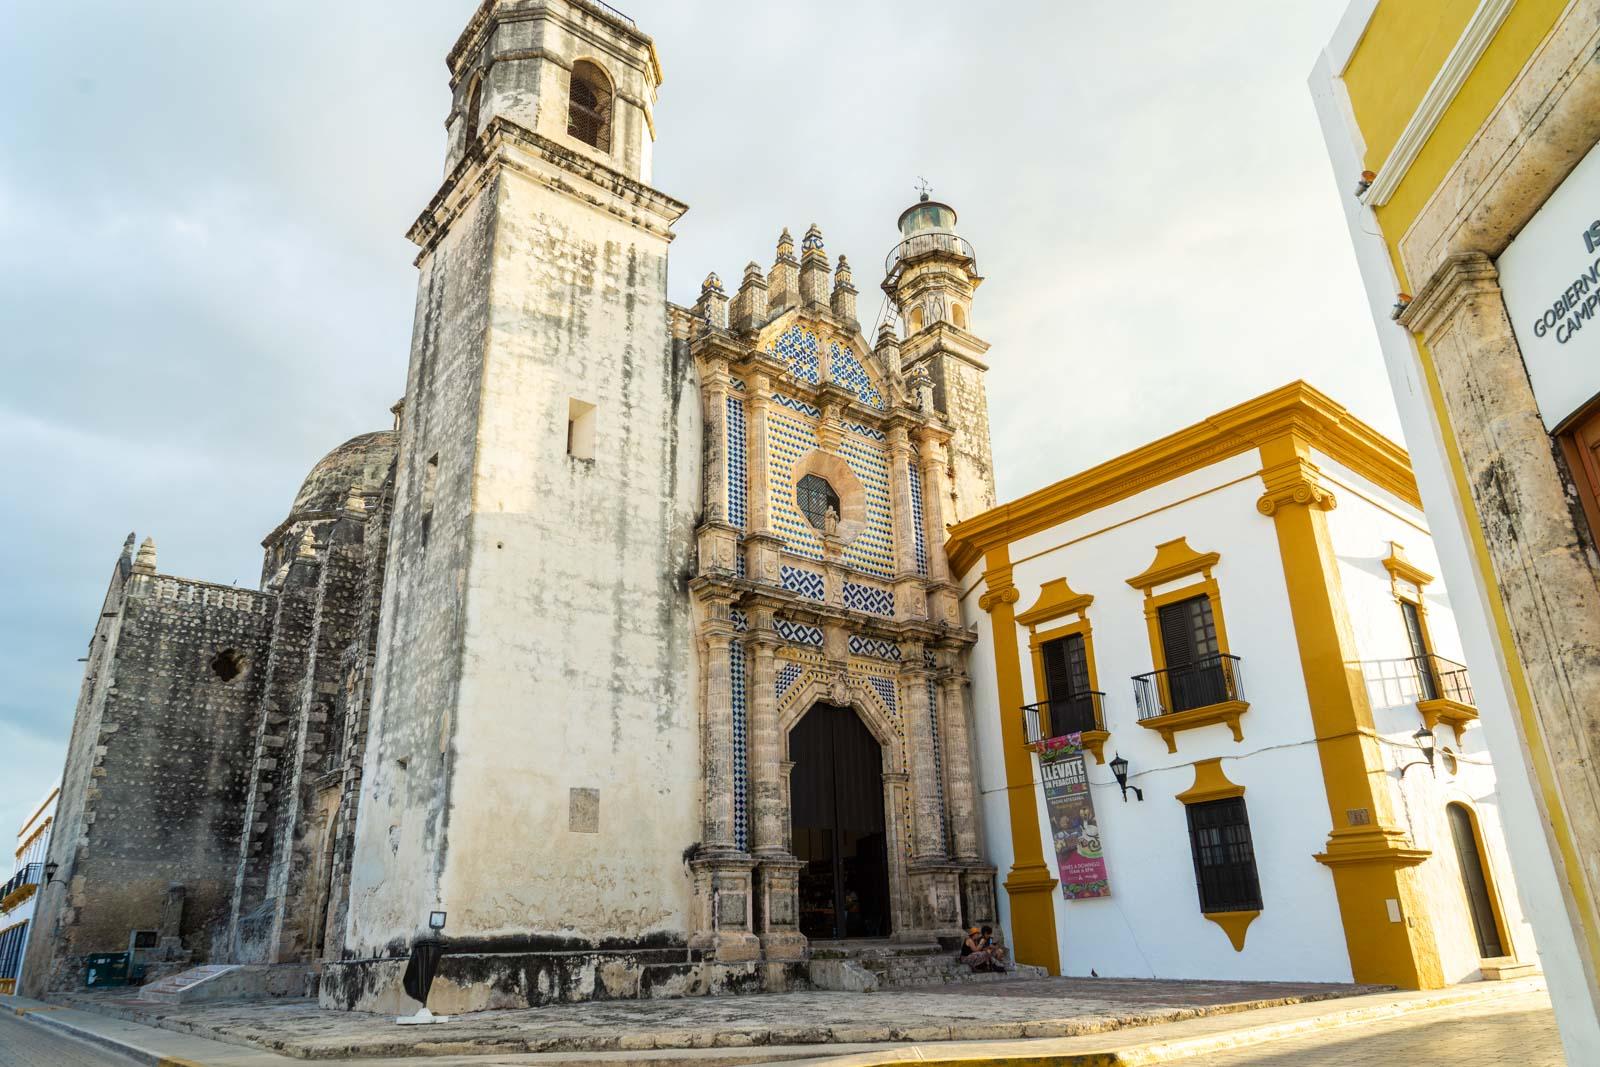 Historic city of Campeche, Mexico